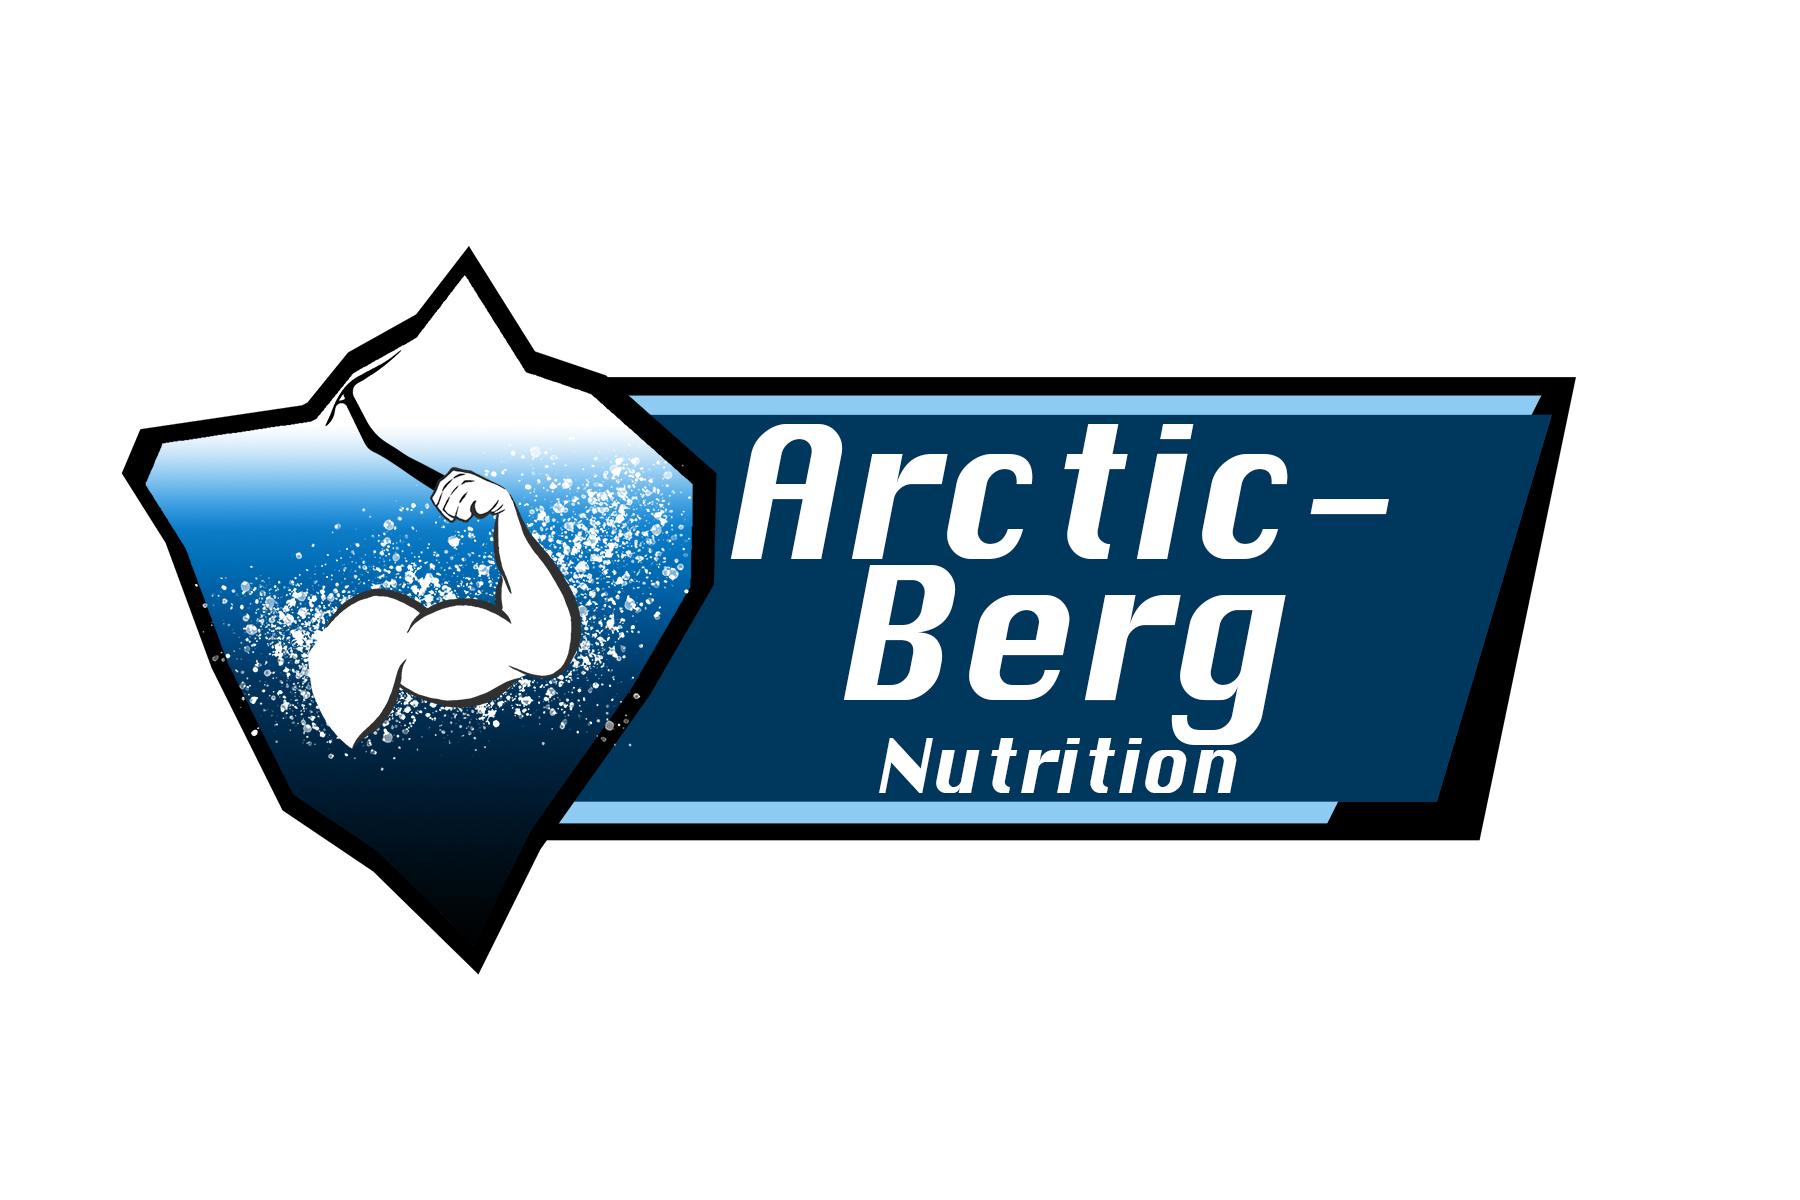 Arctic-Berg Nutrition